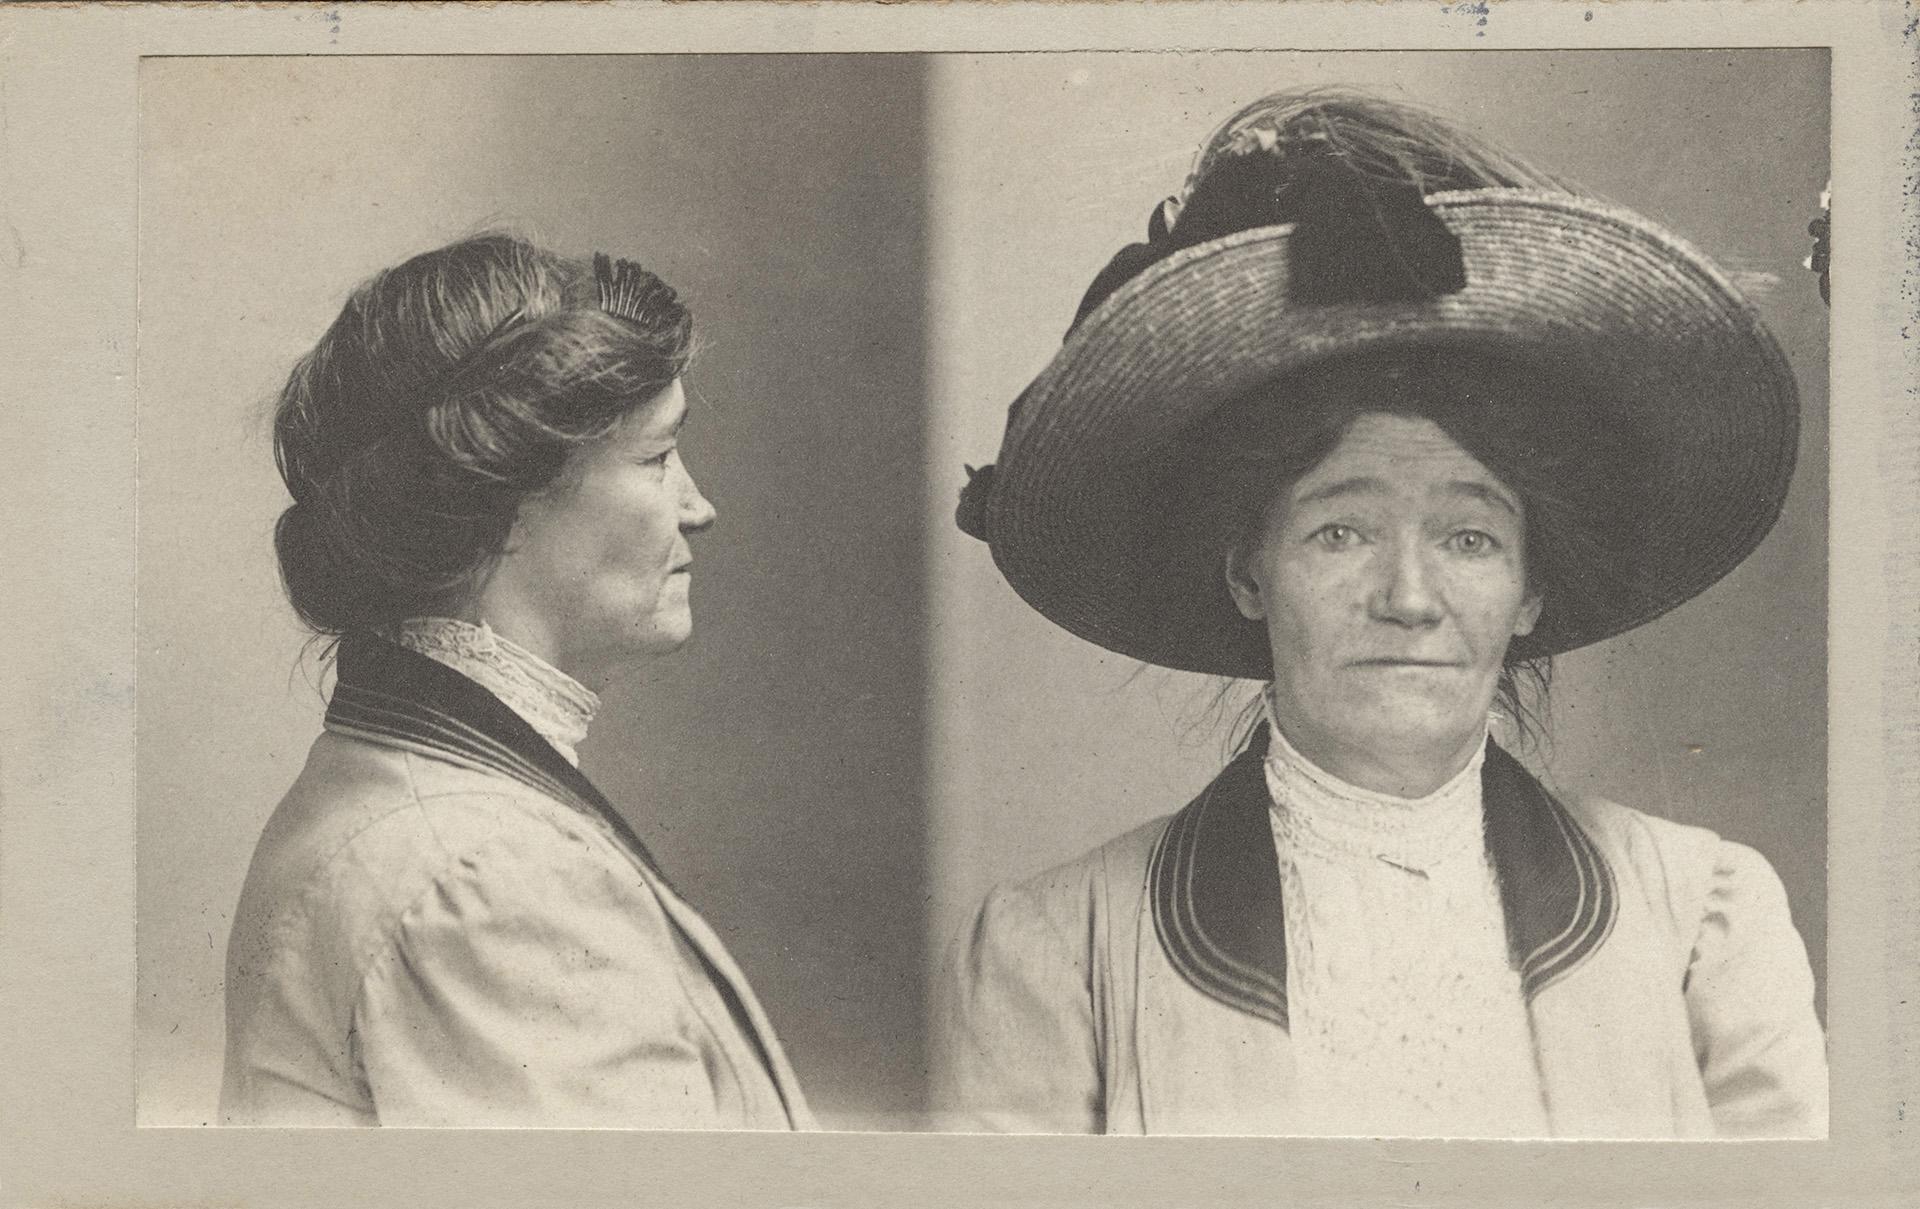 Maggie Moore, August 26, 1910    Crime: Malicious Mischief